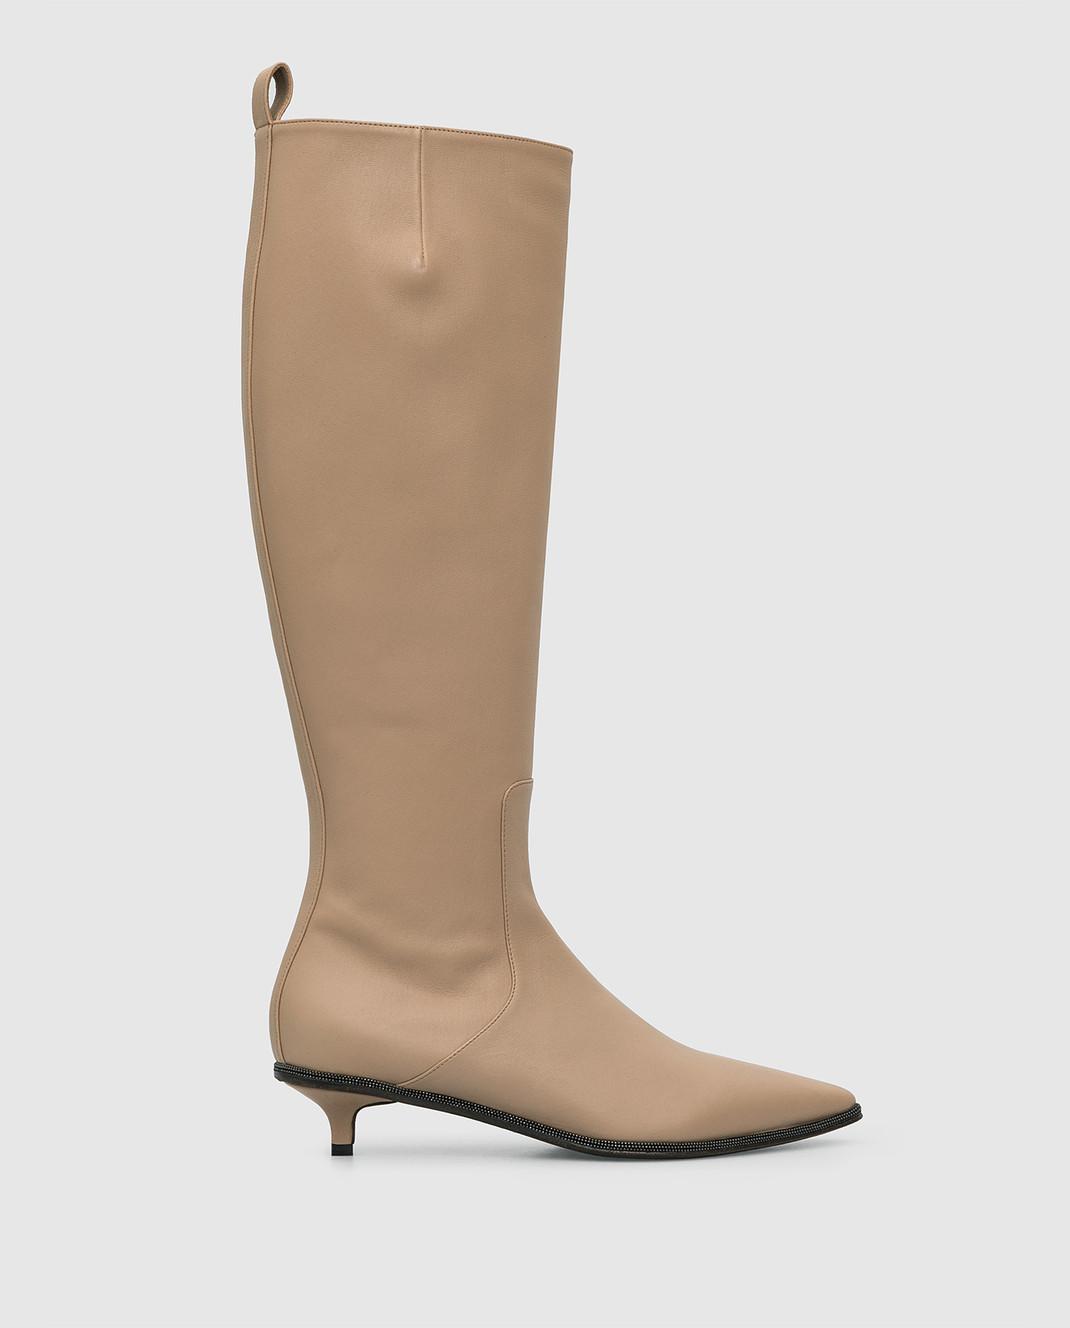 Brunello Cucinelli Бежевые кожаные сапоги изображение 1